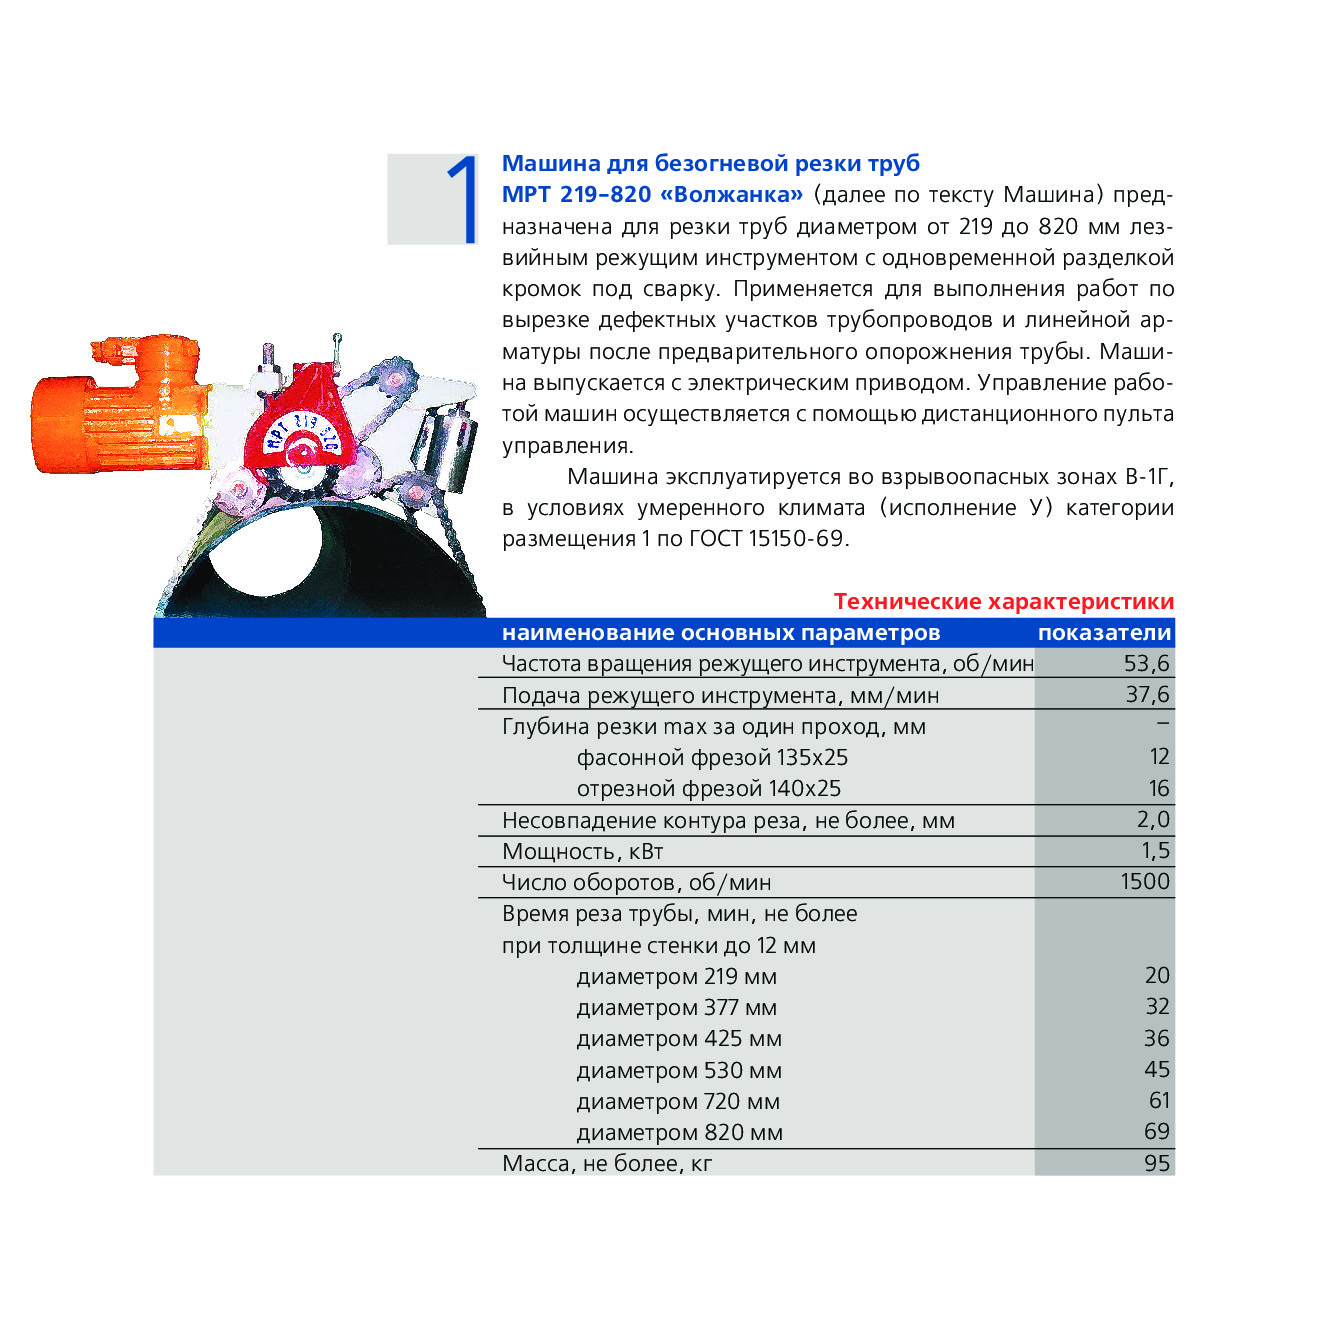 Машина для безогневой резки труб МРТ 219-820 «Волжанка»